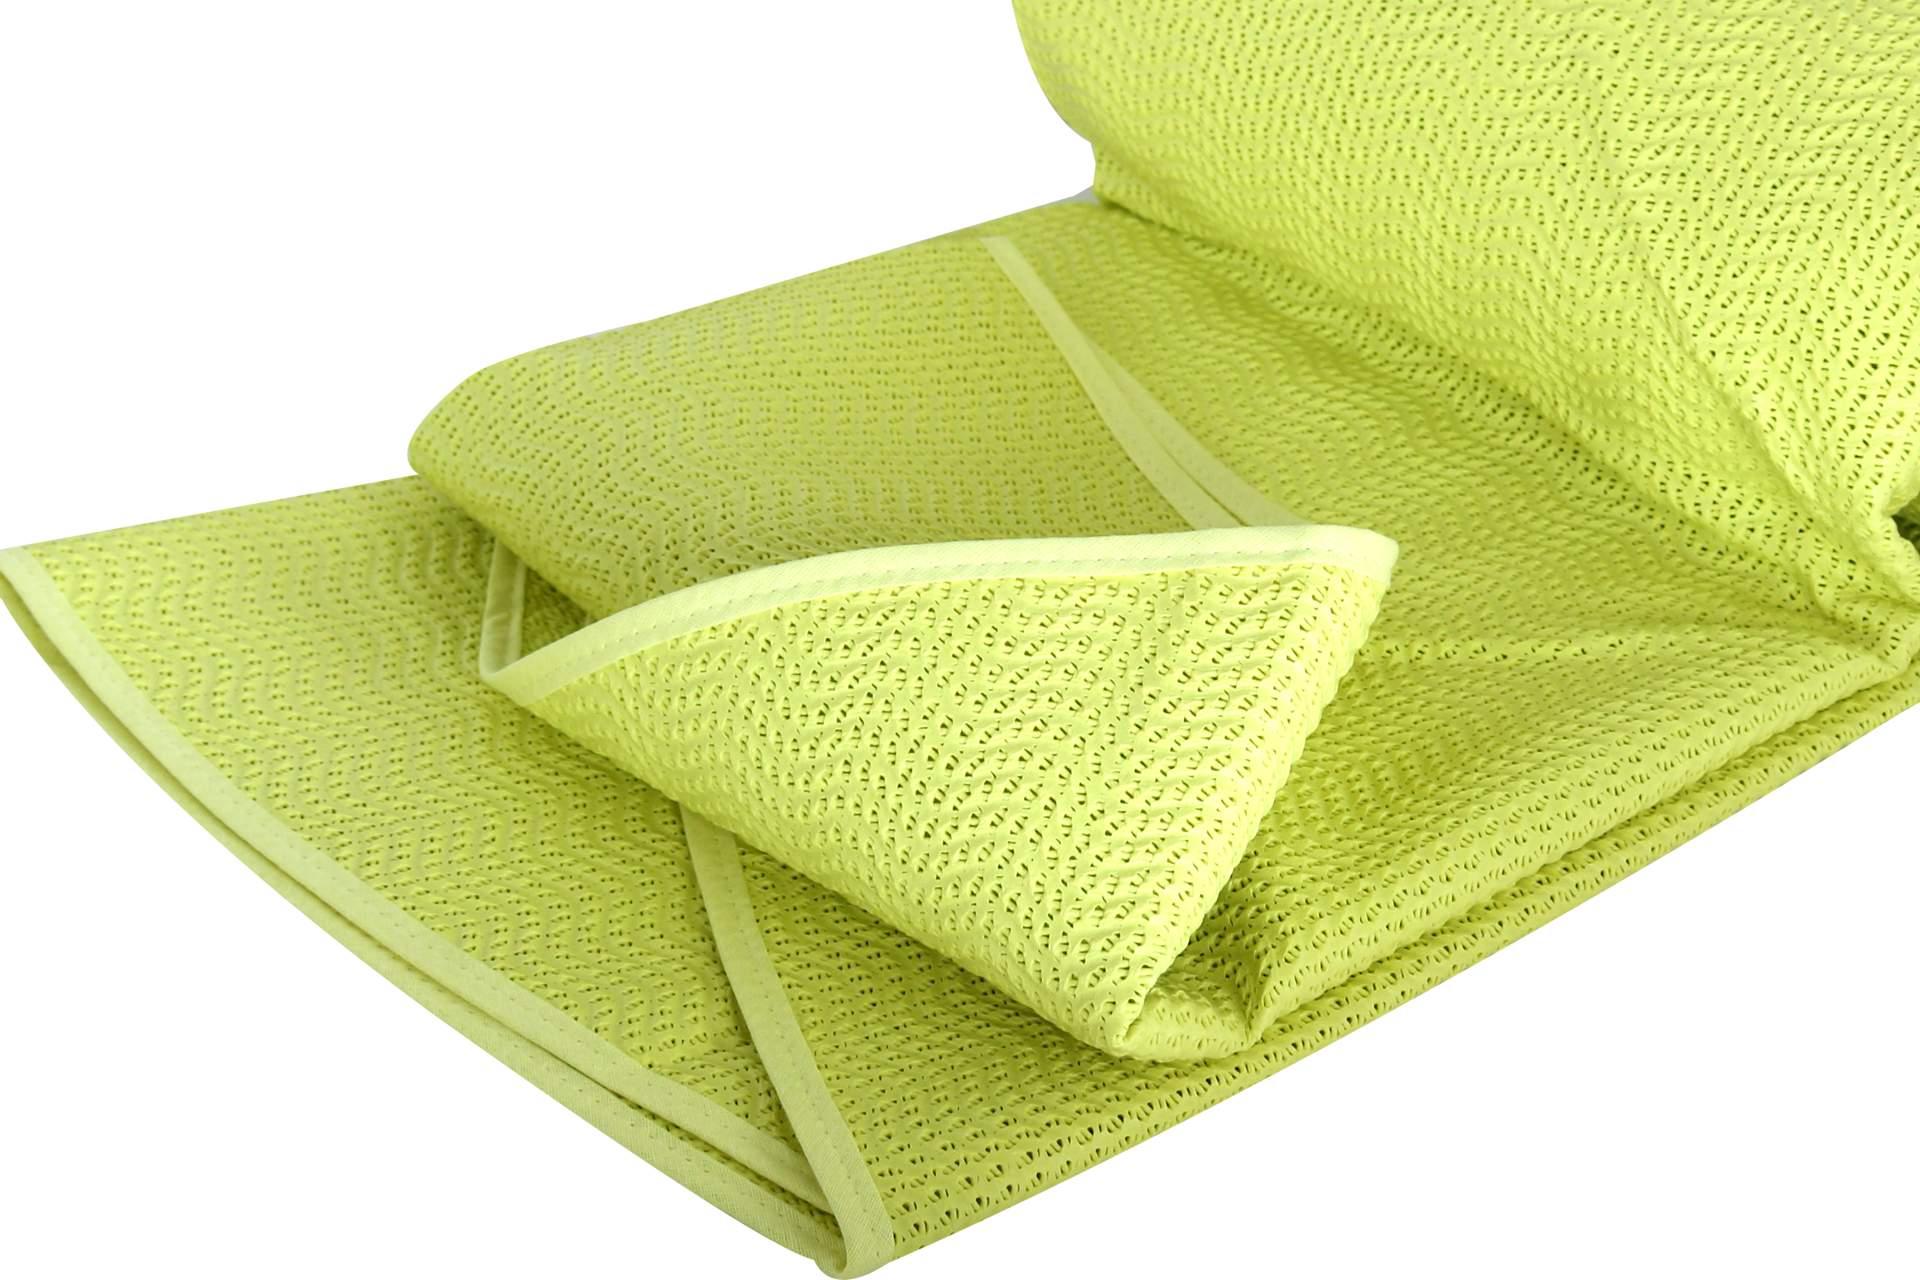 garten tischdecke friedola lemon 130 x 180 cm oval tisch decke wetterbest ndig eur 7 99. Black Bedroom Furniture Sets. Home Design Ideas